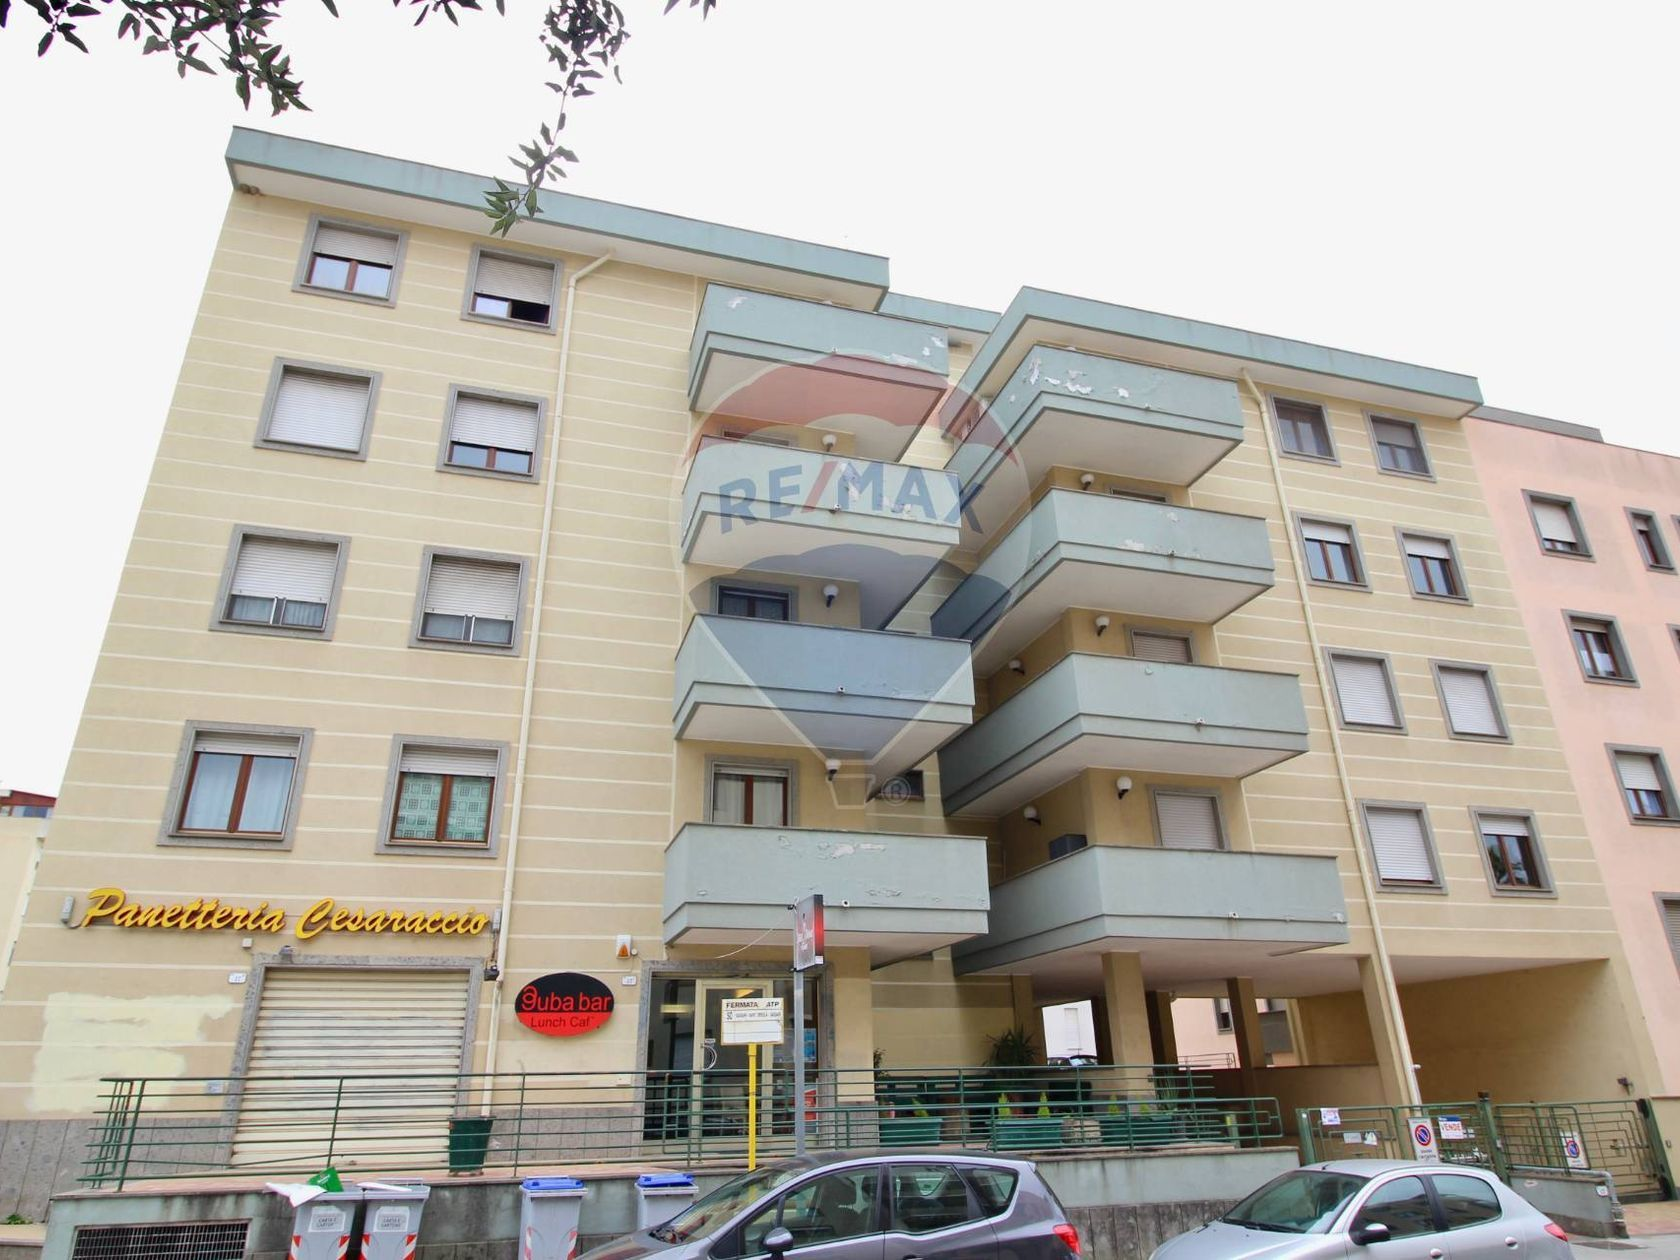 Appartamento Ss-s. Orsola Storica, Sassari, SS Vendita